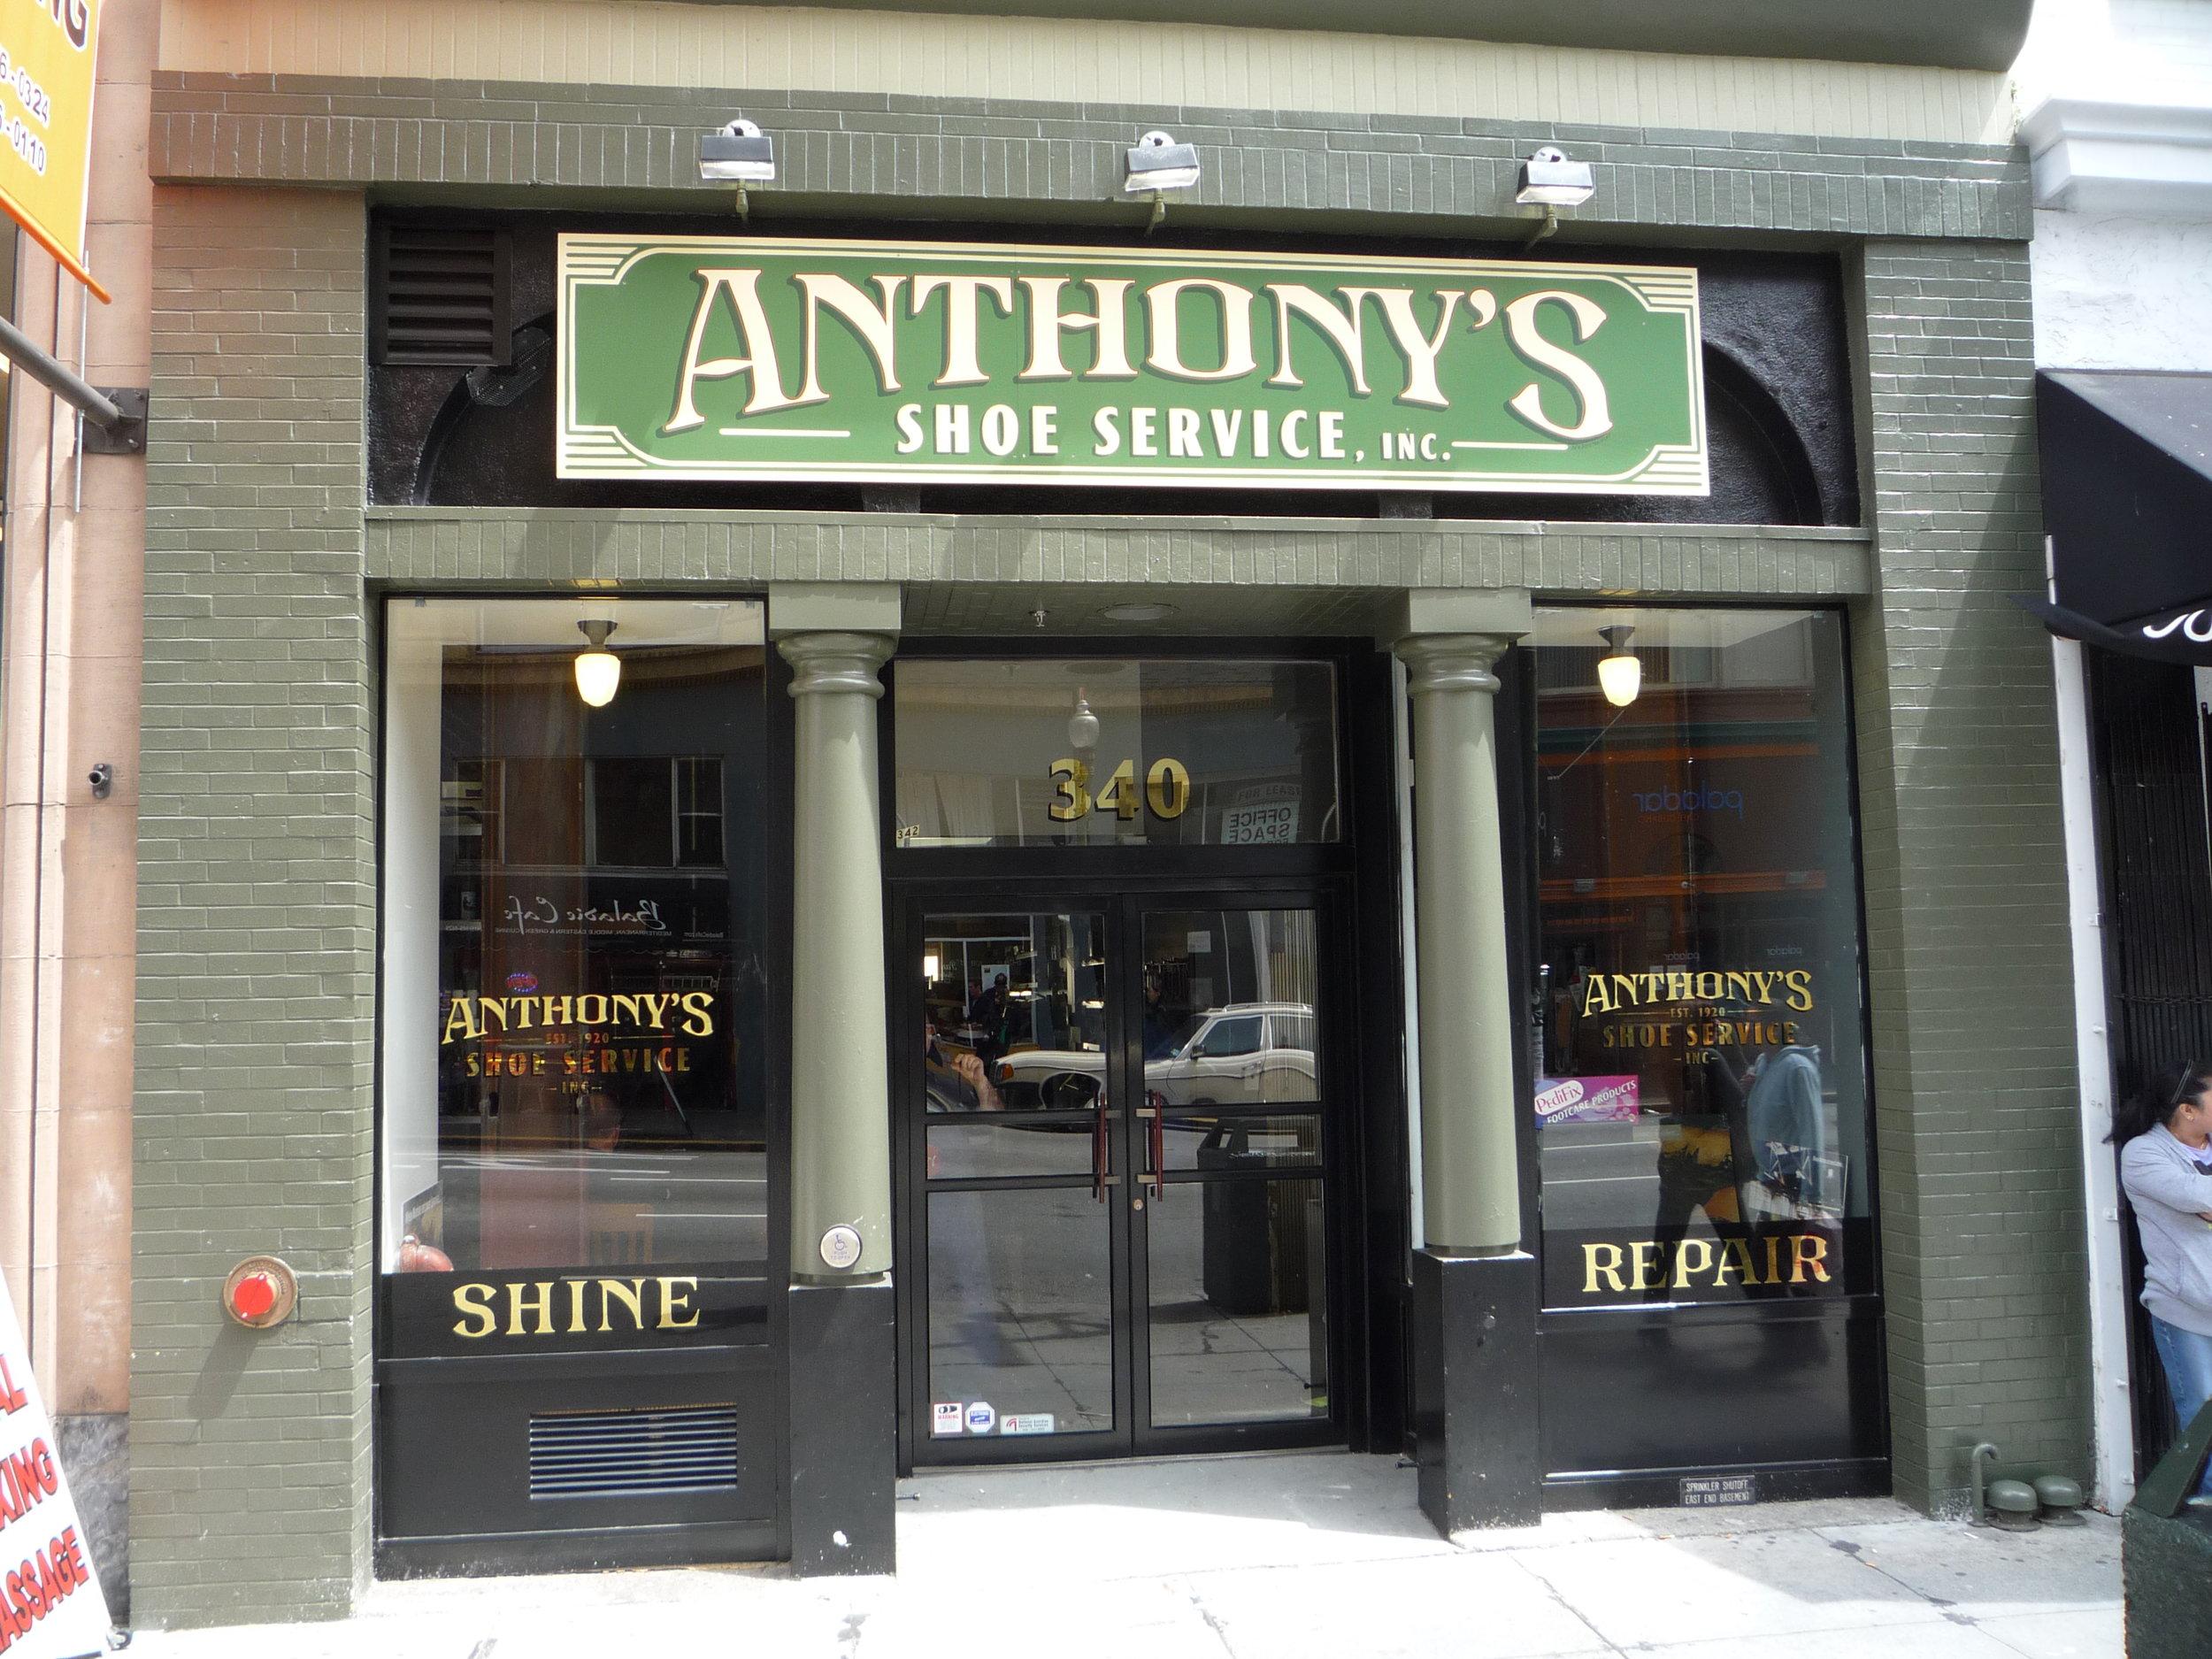 ORIG-anthonys-shoe-service-shine-repair-and-transom-address_5878430871_o.jpg